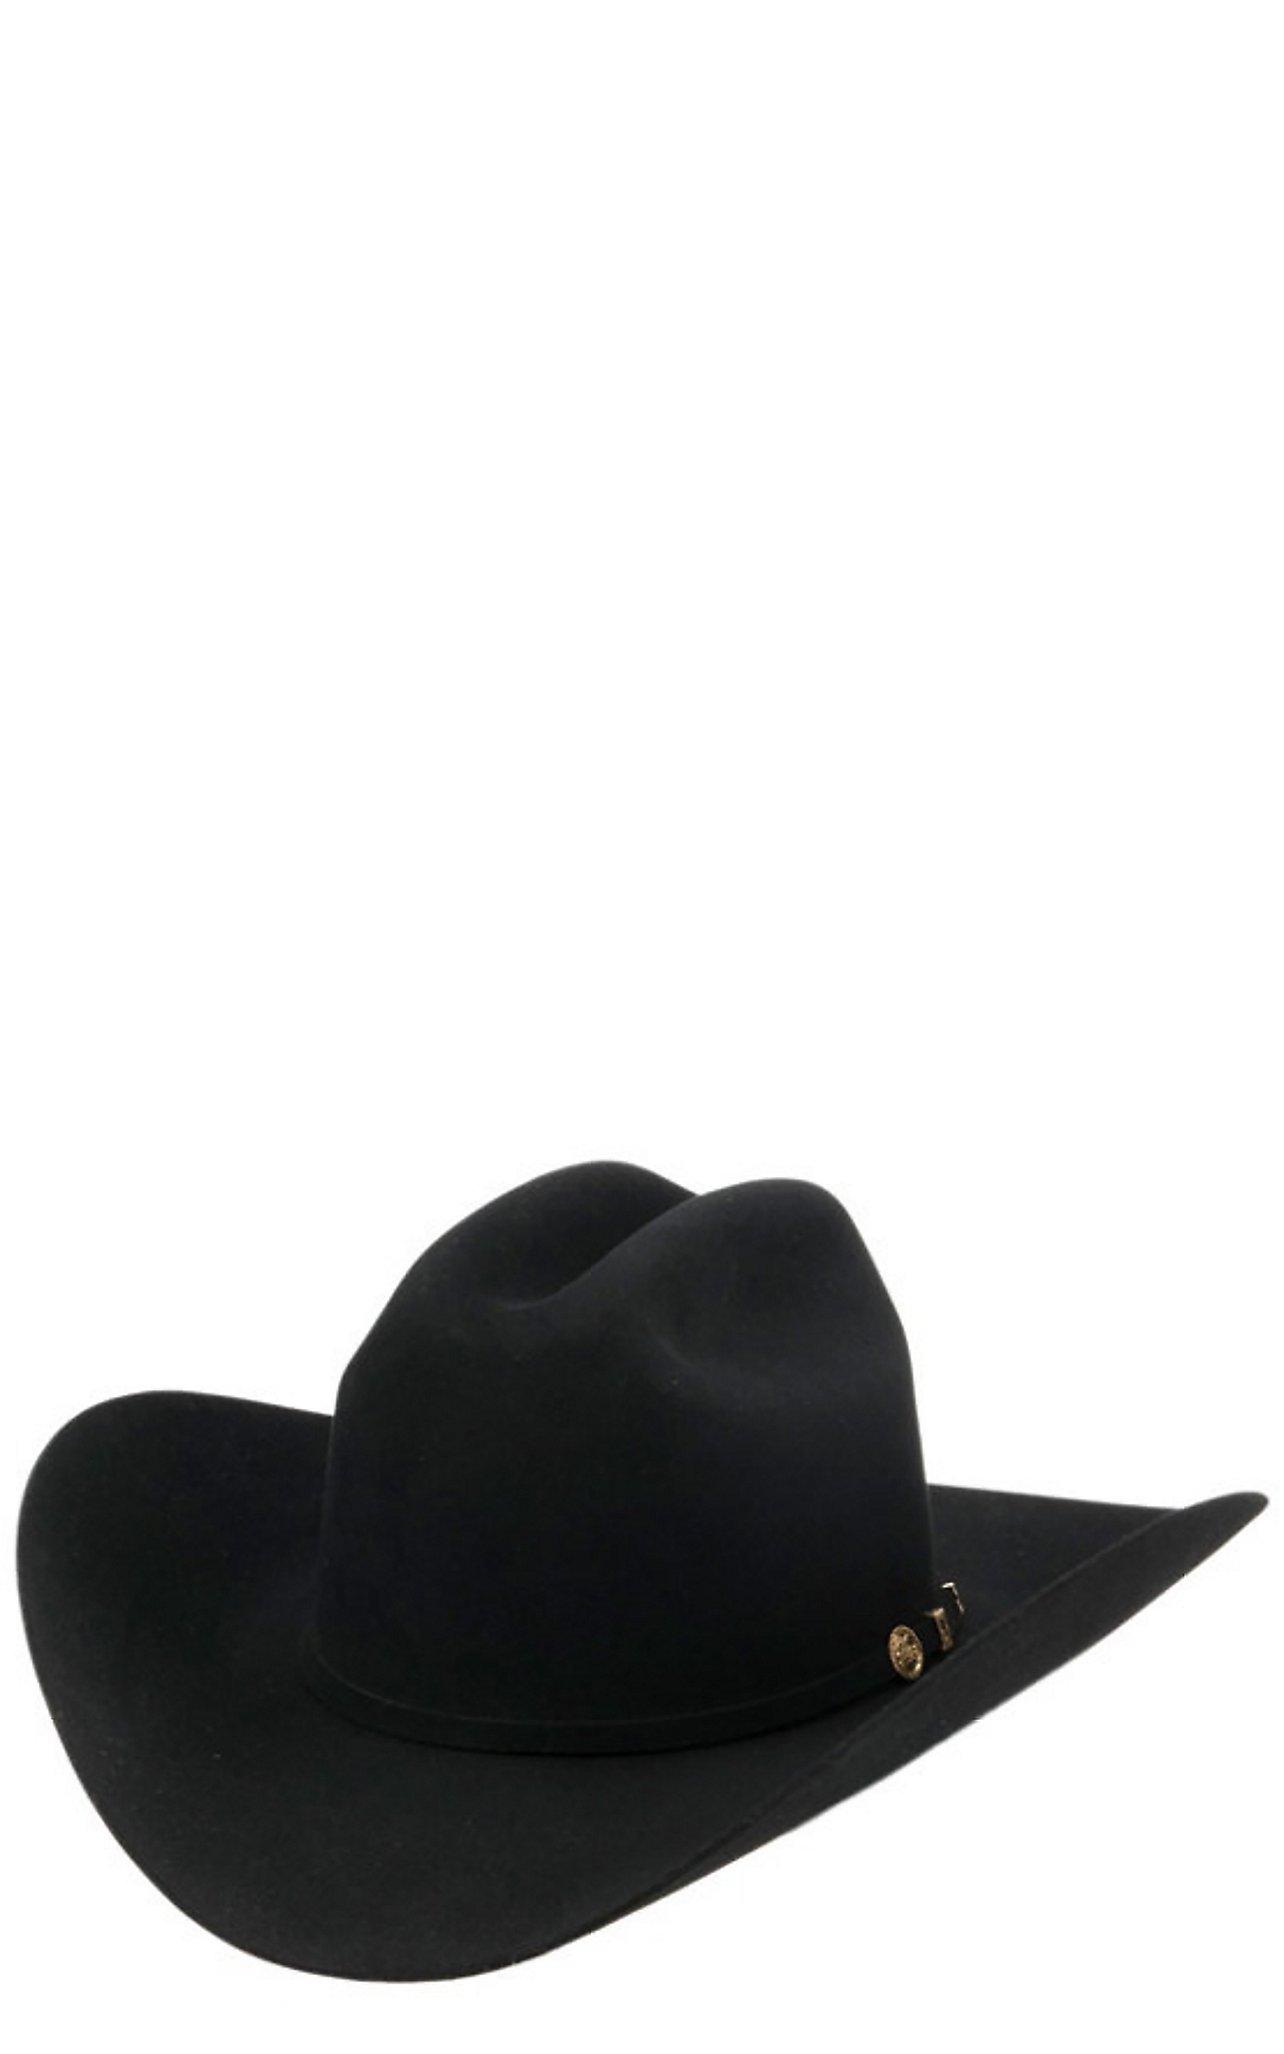 Stetson  Stetson 100X El Presidente Black Felt Cowboy Hat e6f76b0fa32